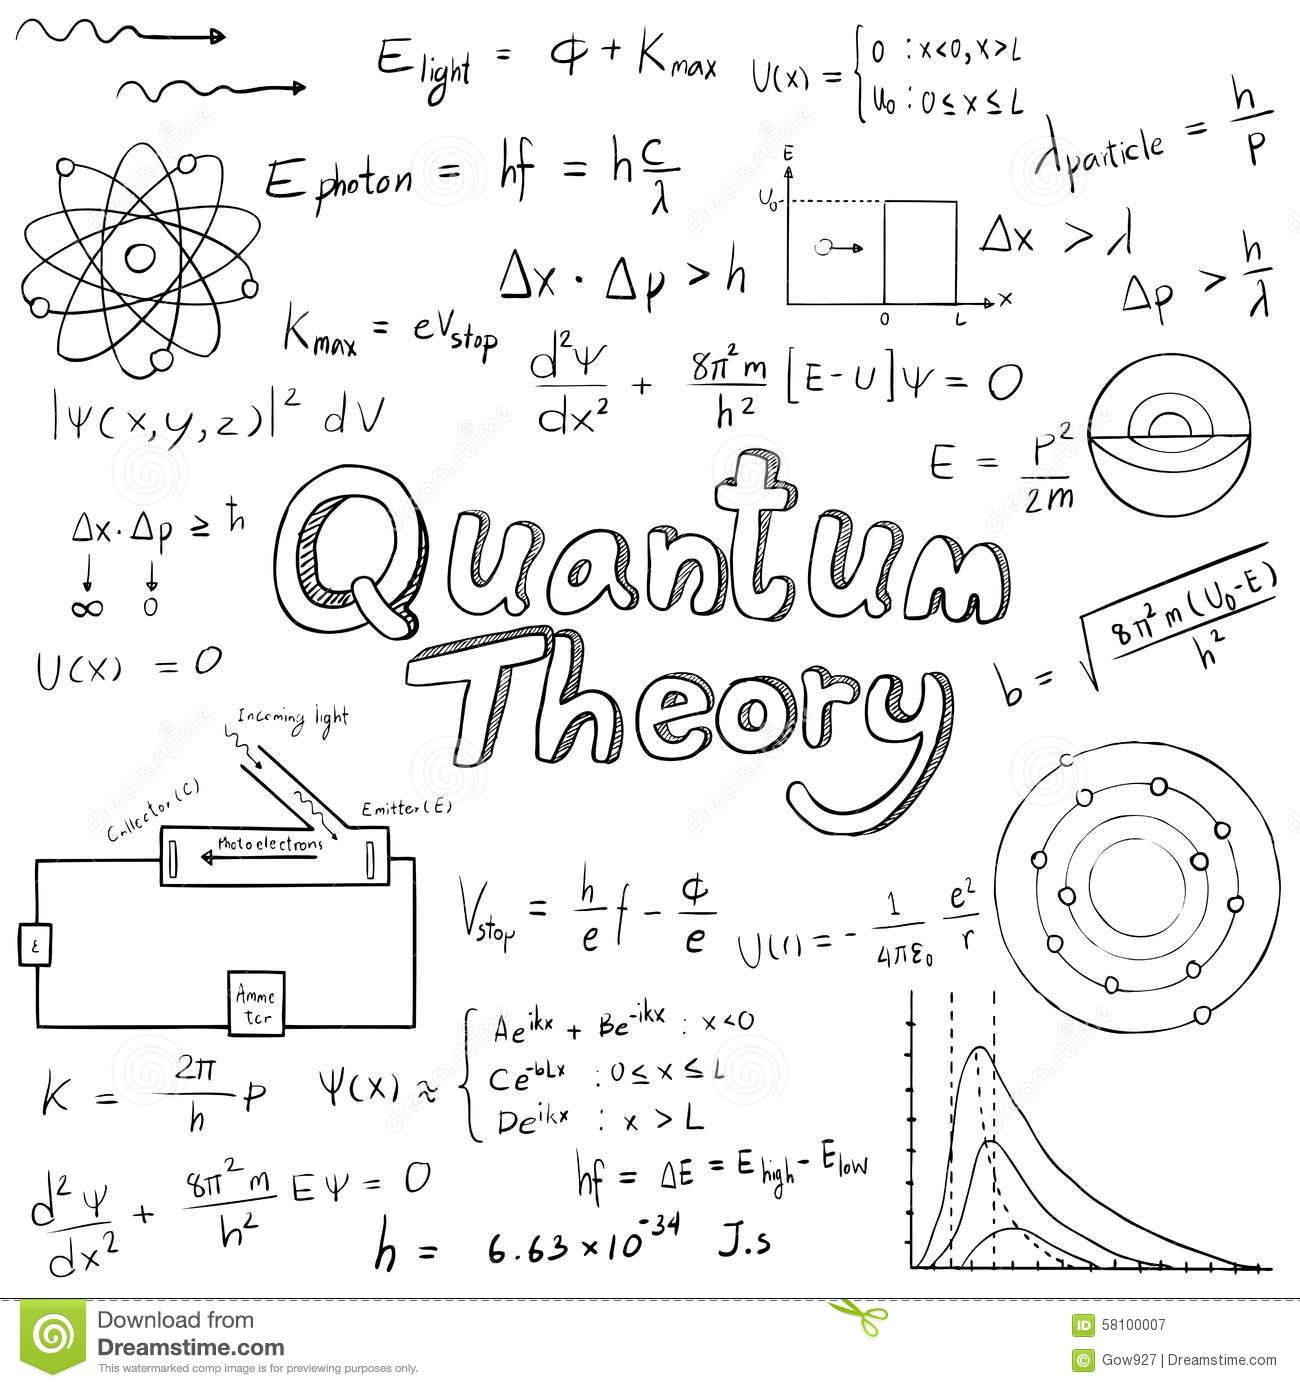 Quantum Theory Law Physics Mathematical Formula Equation